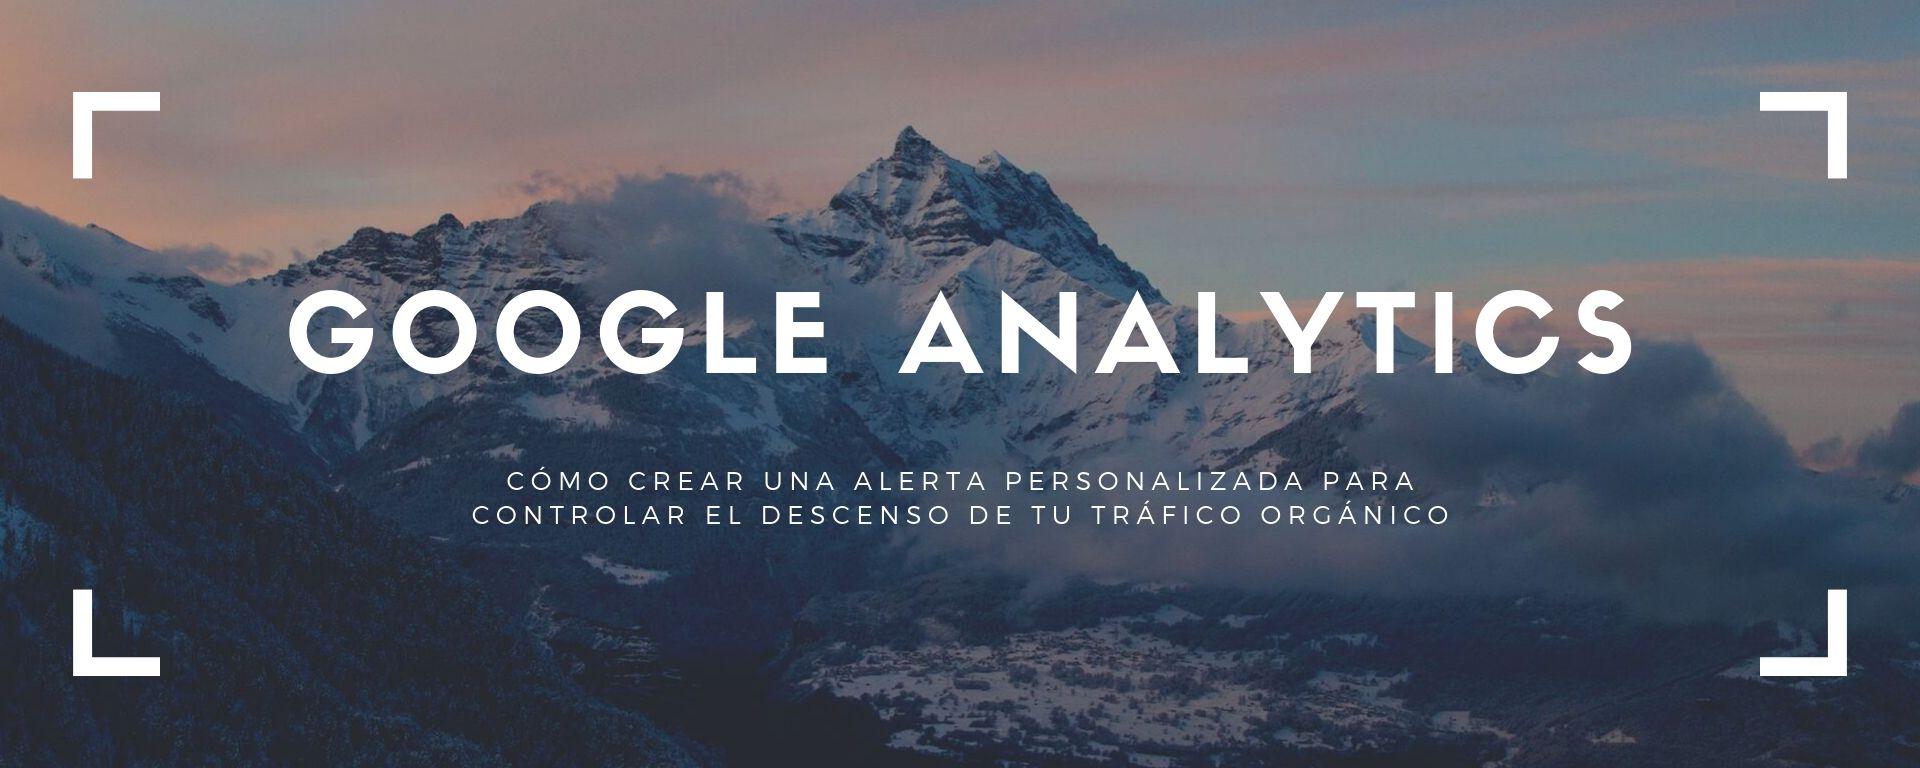 Alertas Google Analytics descenso tráfico orgánico